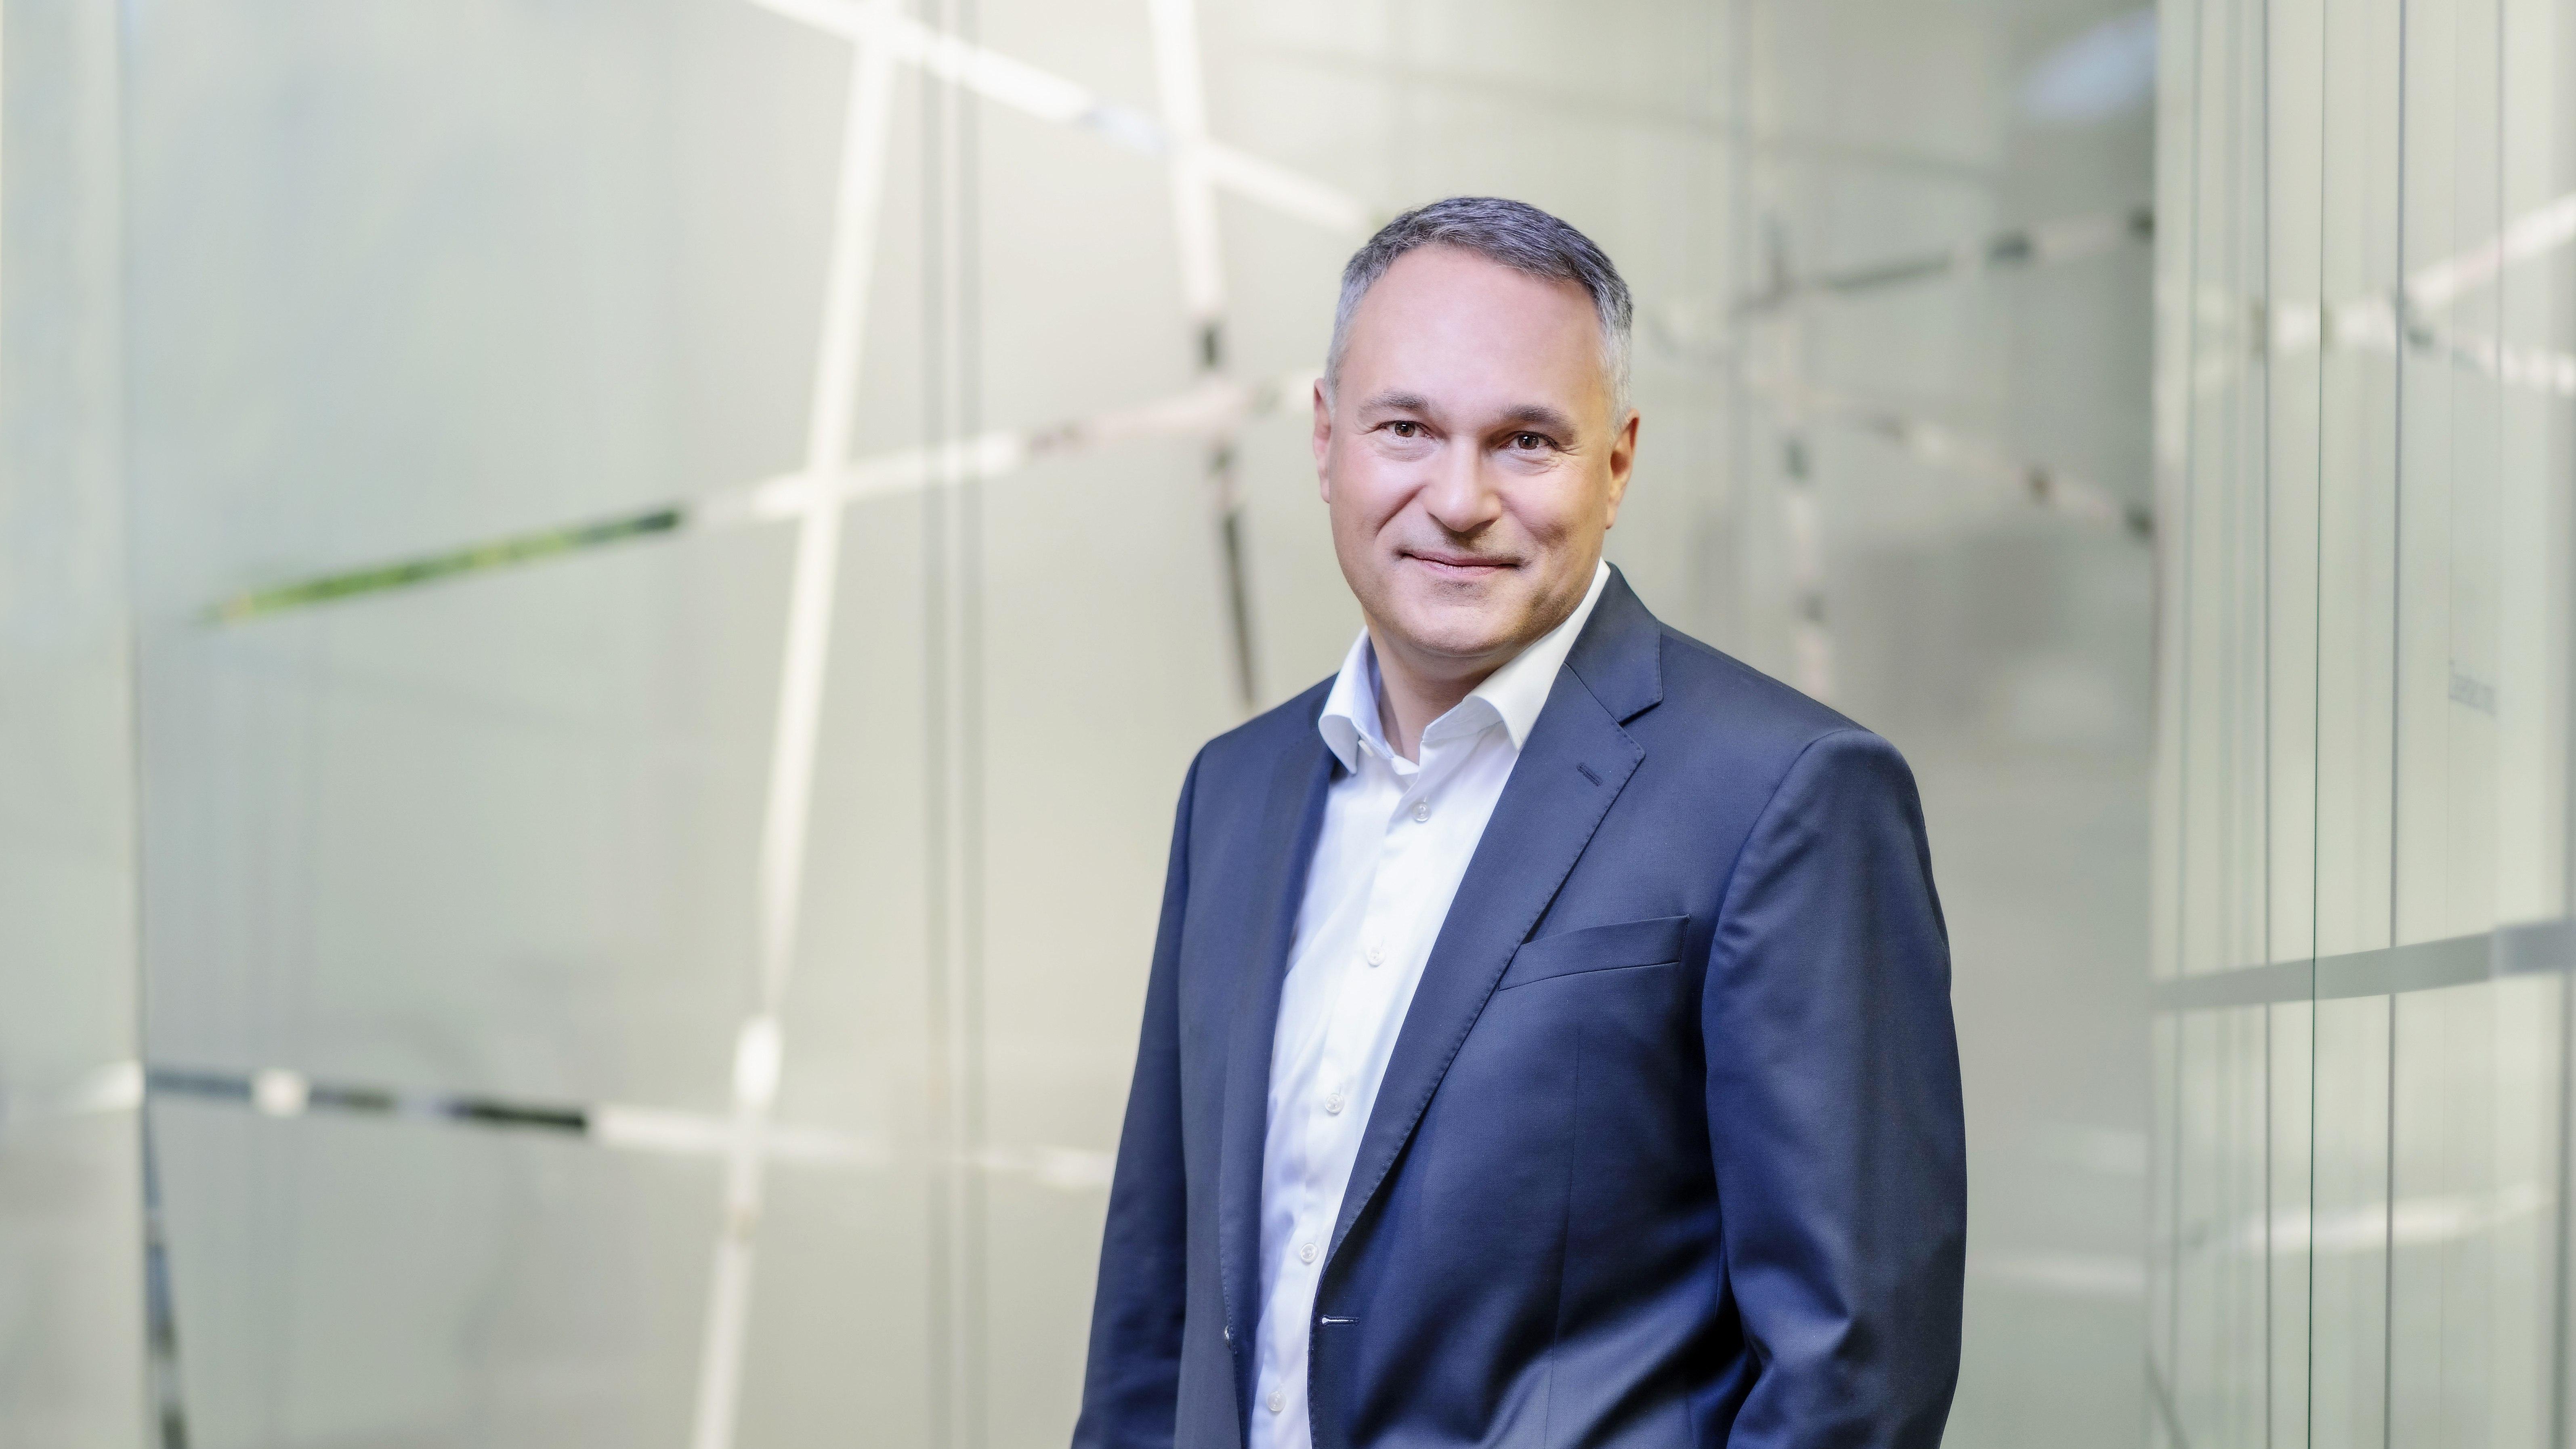 Dr Florian Weymar to head SKODA AUTO Quality Assurance - Image 2